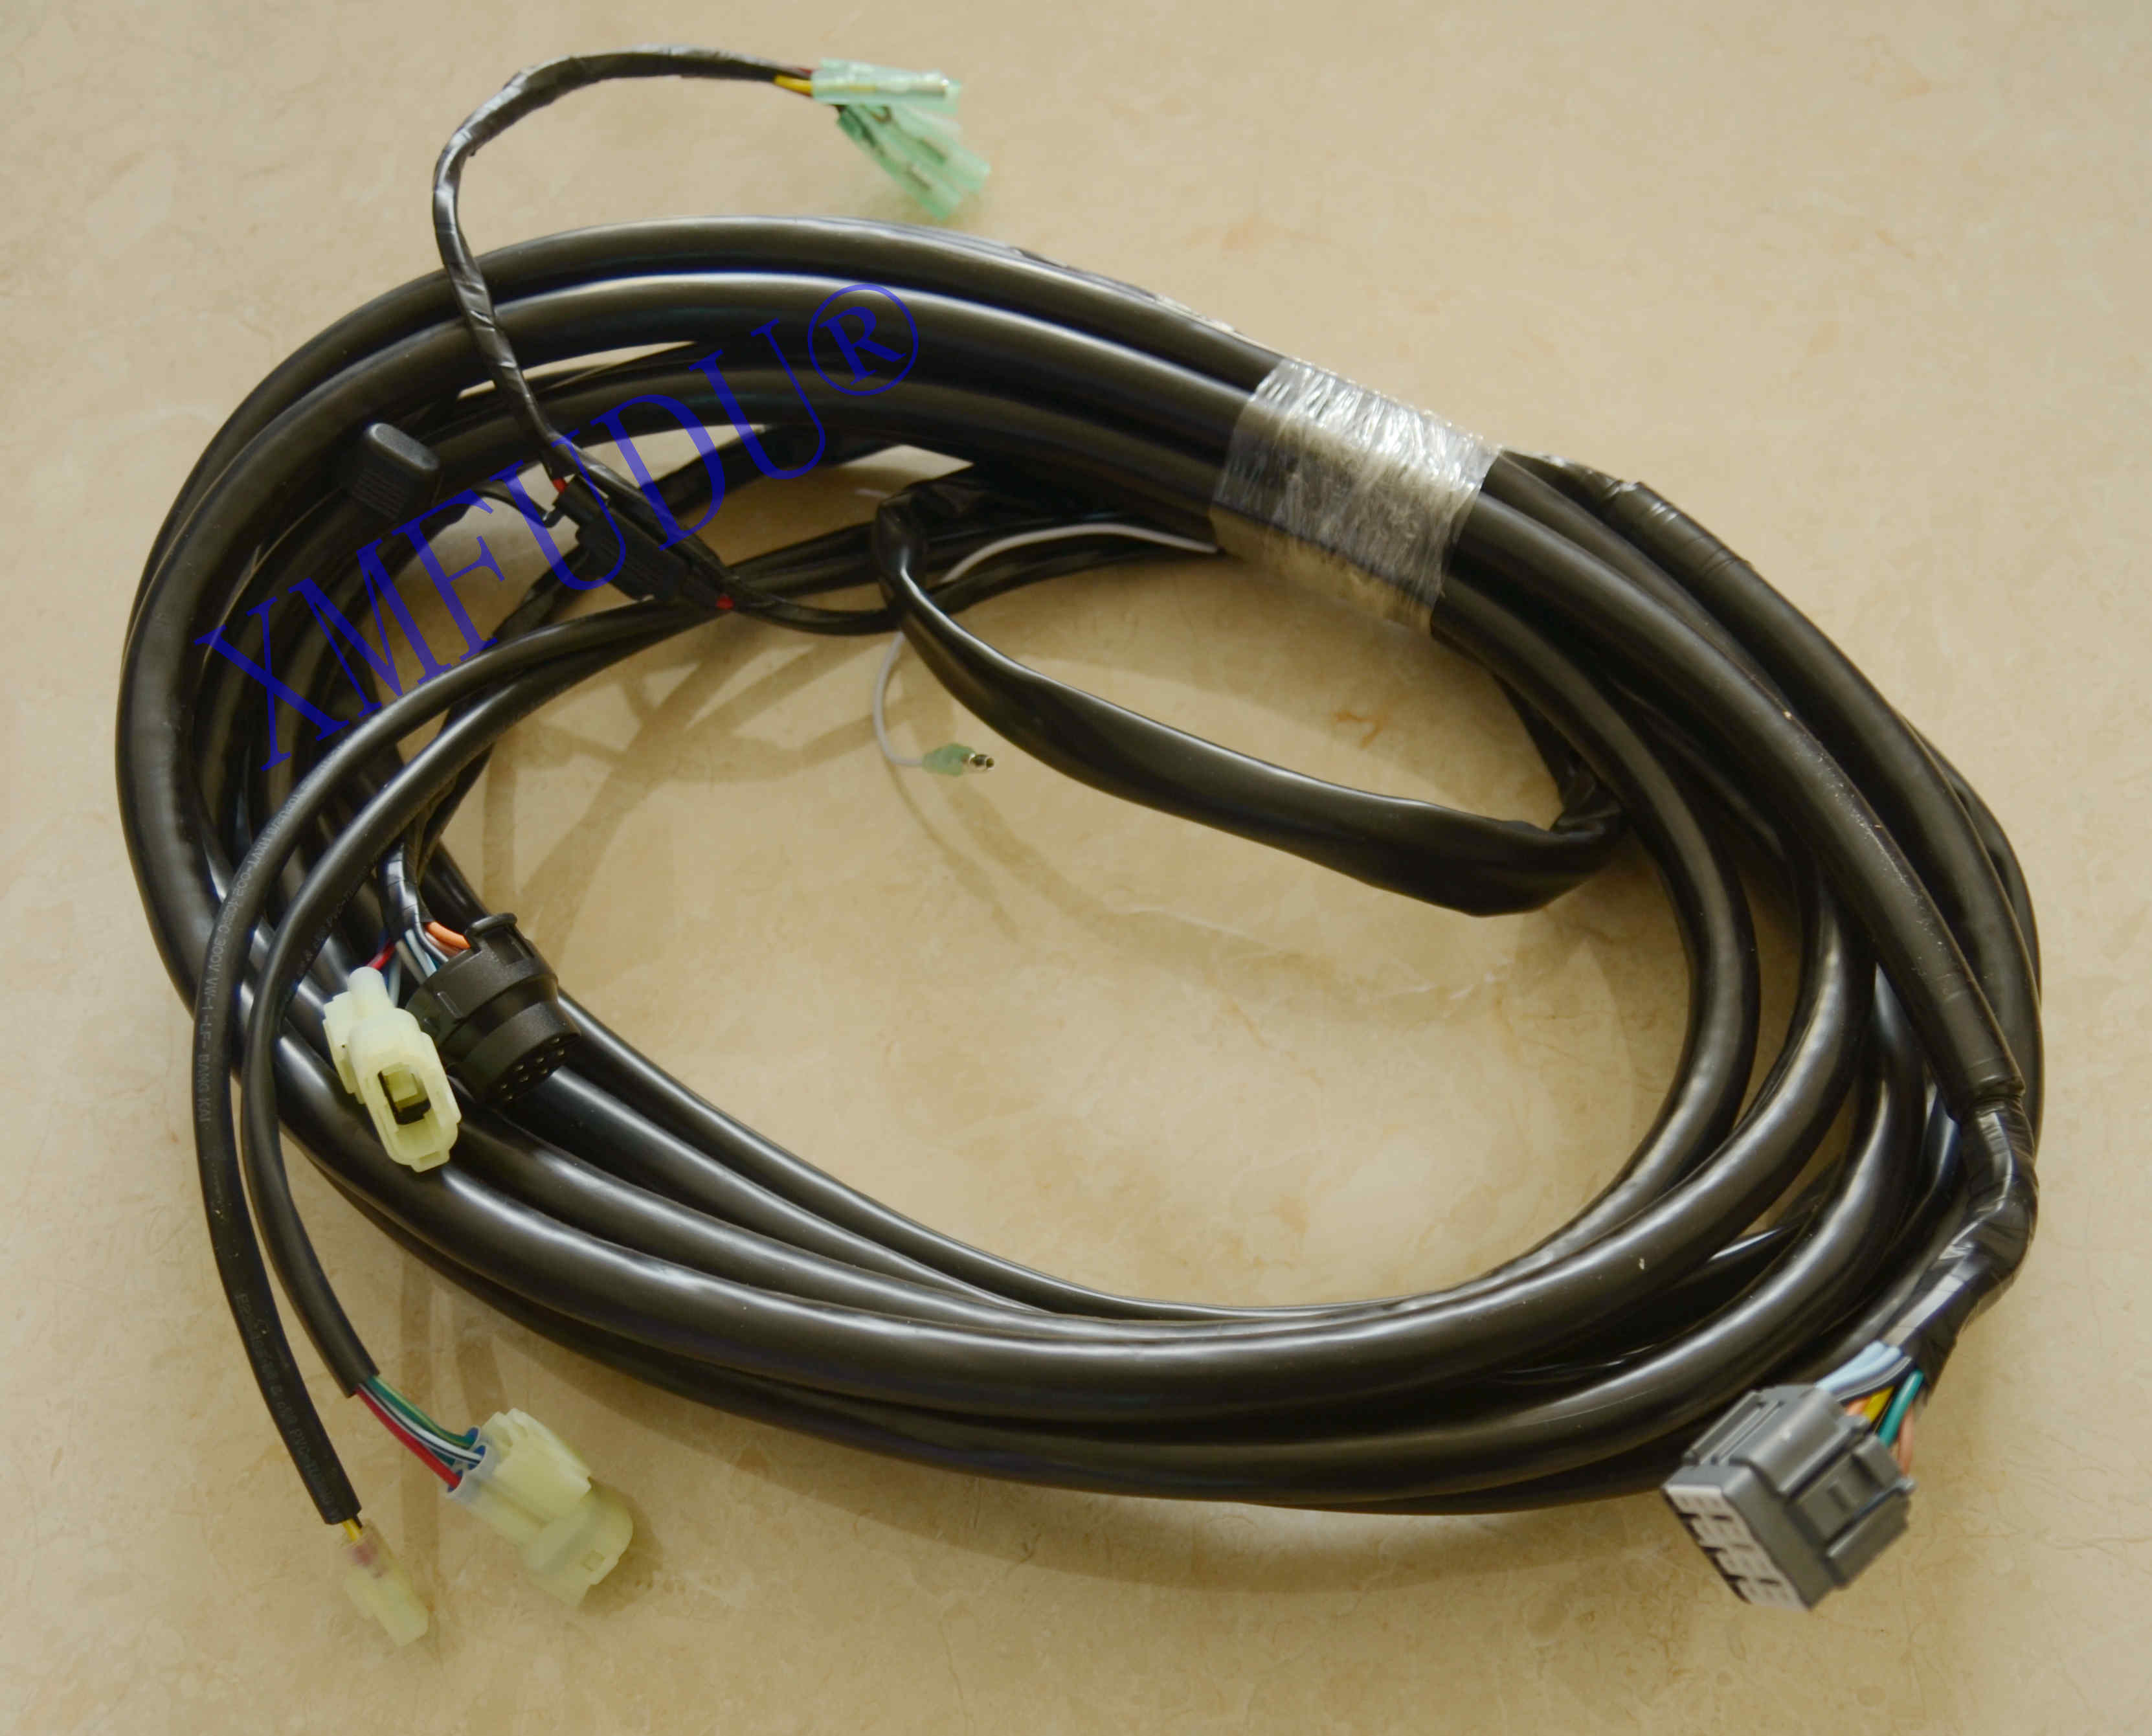 US $99.99 |0176341 New System Check 20ft 6.1m Main Modular Ignition on johnson neutral safety switch, johnson fuel tank, johnson hardware, johnson thermostat, johnson ignition switch,